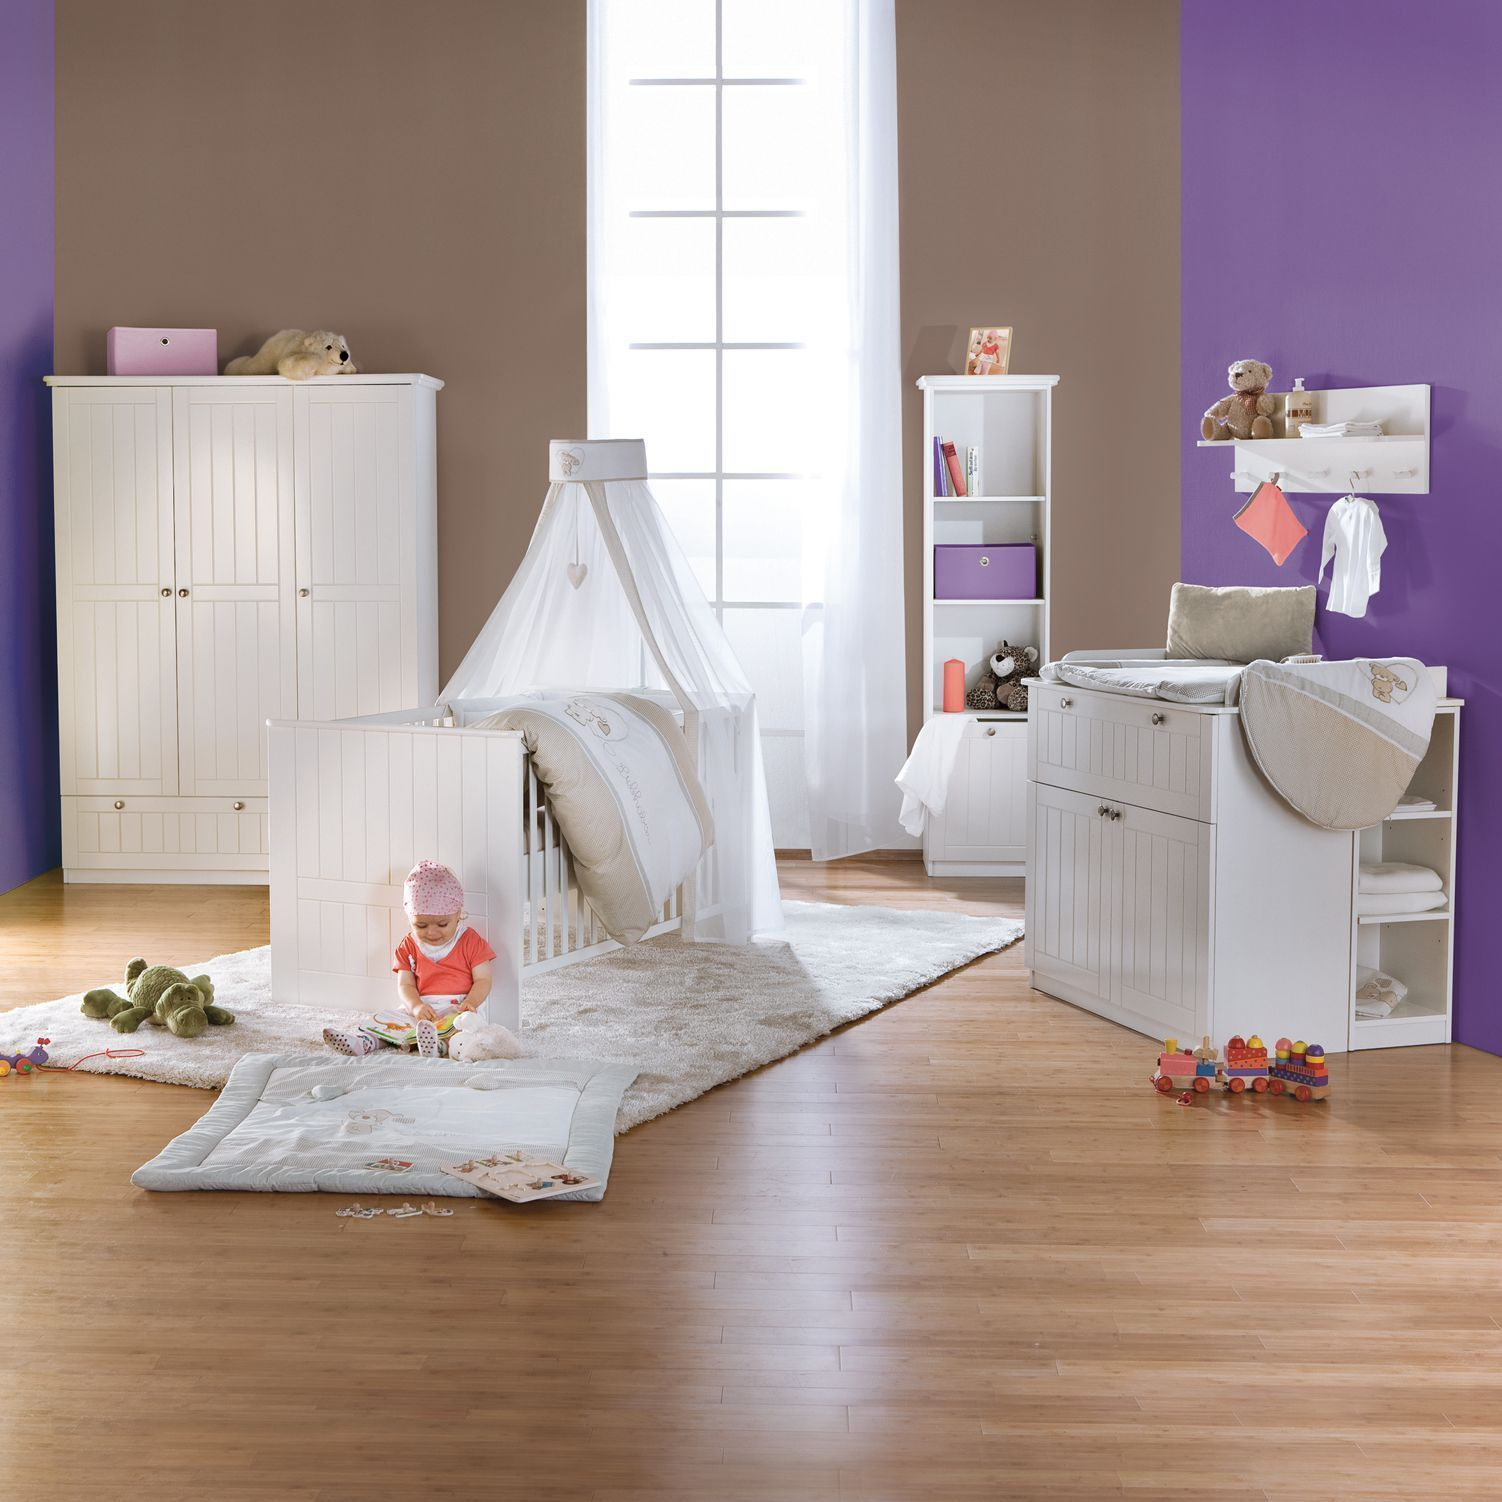 Sparset Dreamworld 2 3 Teilig Babybett Kinderzimmer Kinder